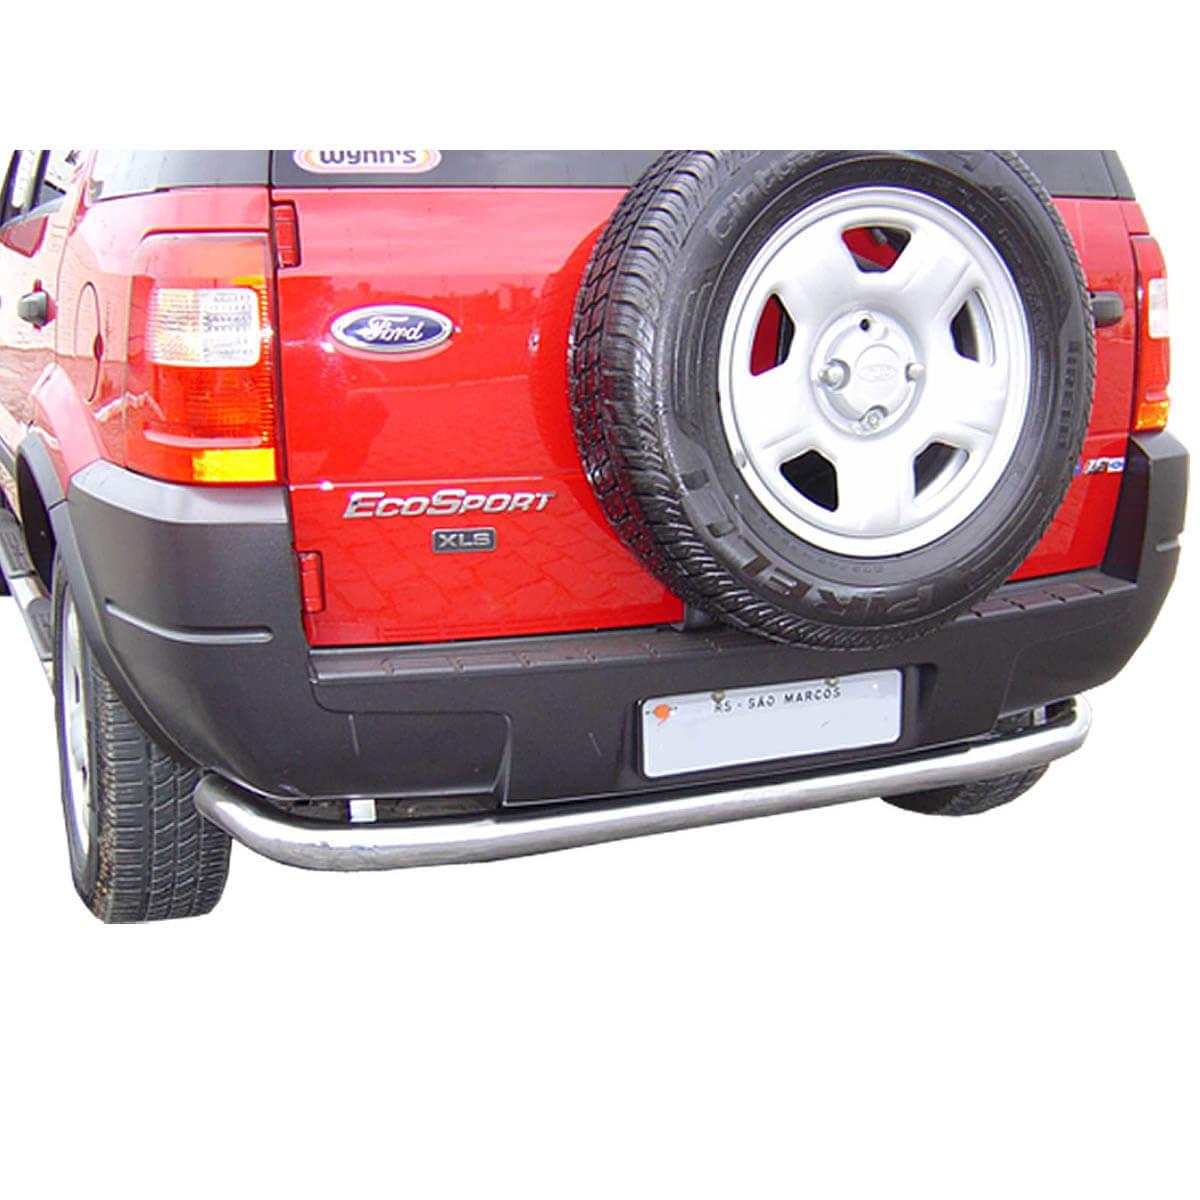 Protetor de para choque traseiro Ecosport 2003 a 2012